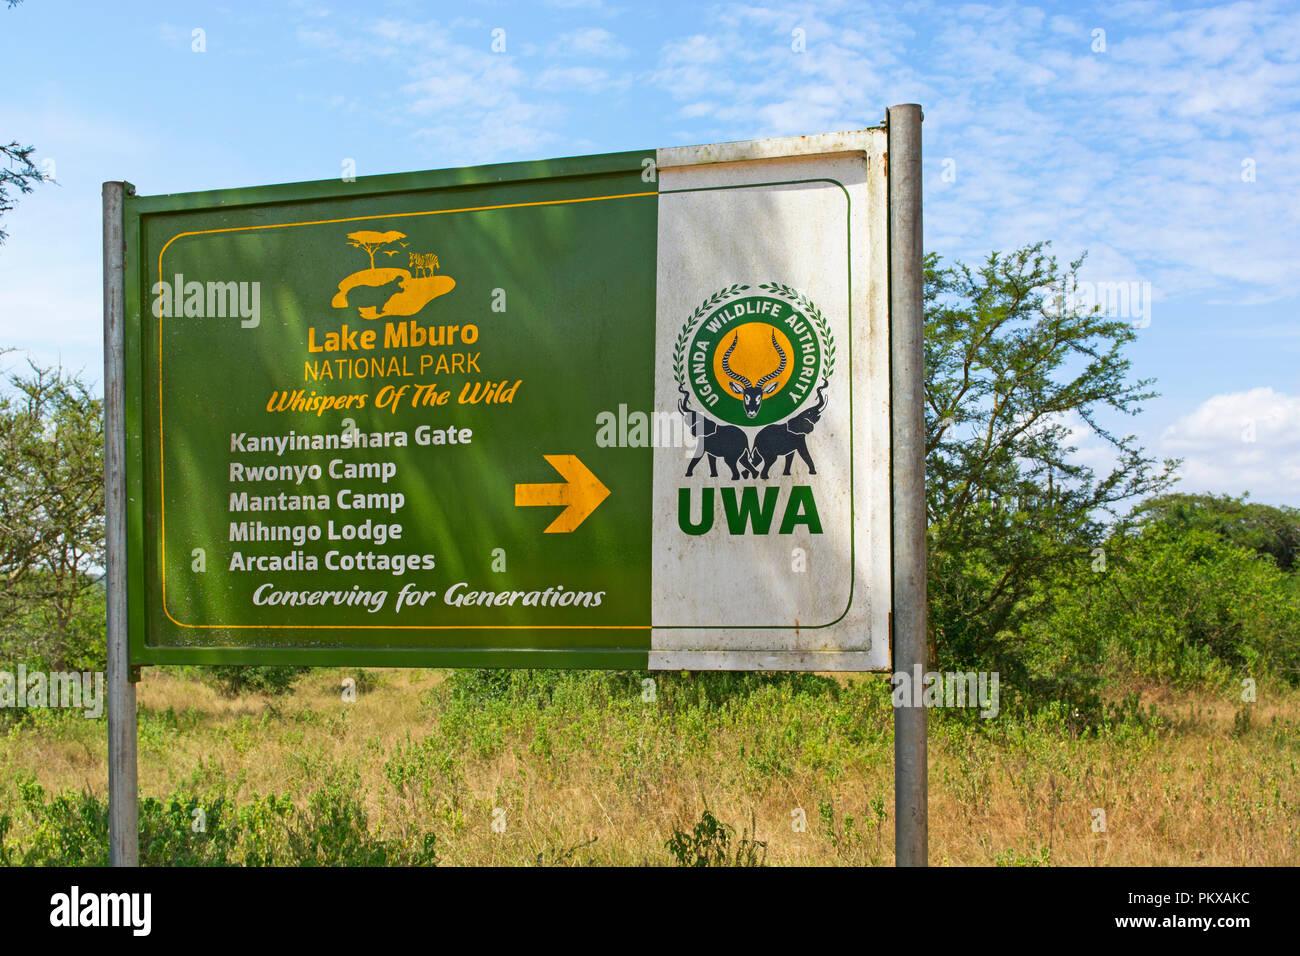 Segno, Lago Mburo Parco nazionale con le indicazioni per Kwaninyanshara Gate, Rwonyo Camp, Mantana Camp, Mihingo Lodge & Arcadia Cottages, Uganda Africa orientale Immagini Stock